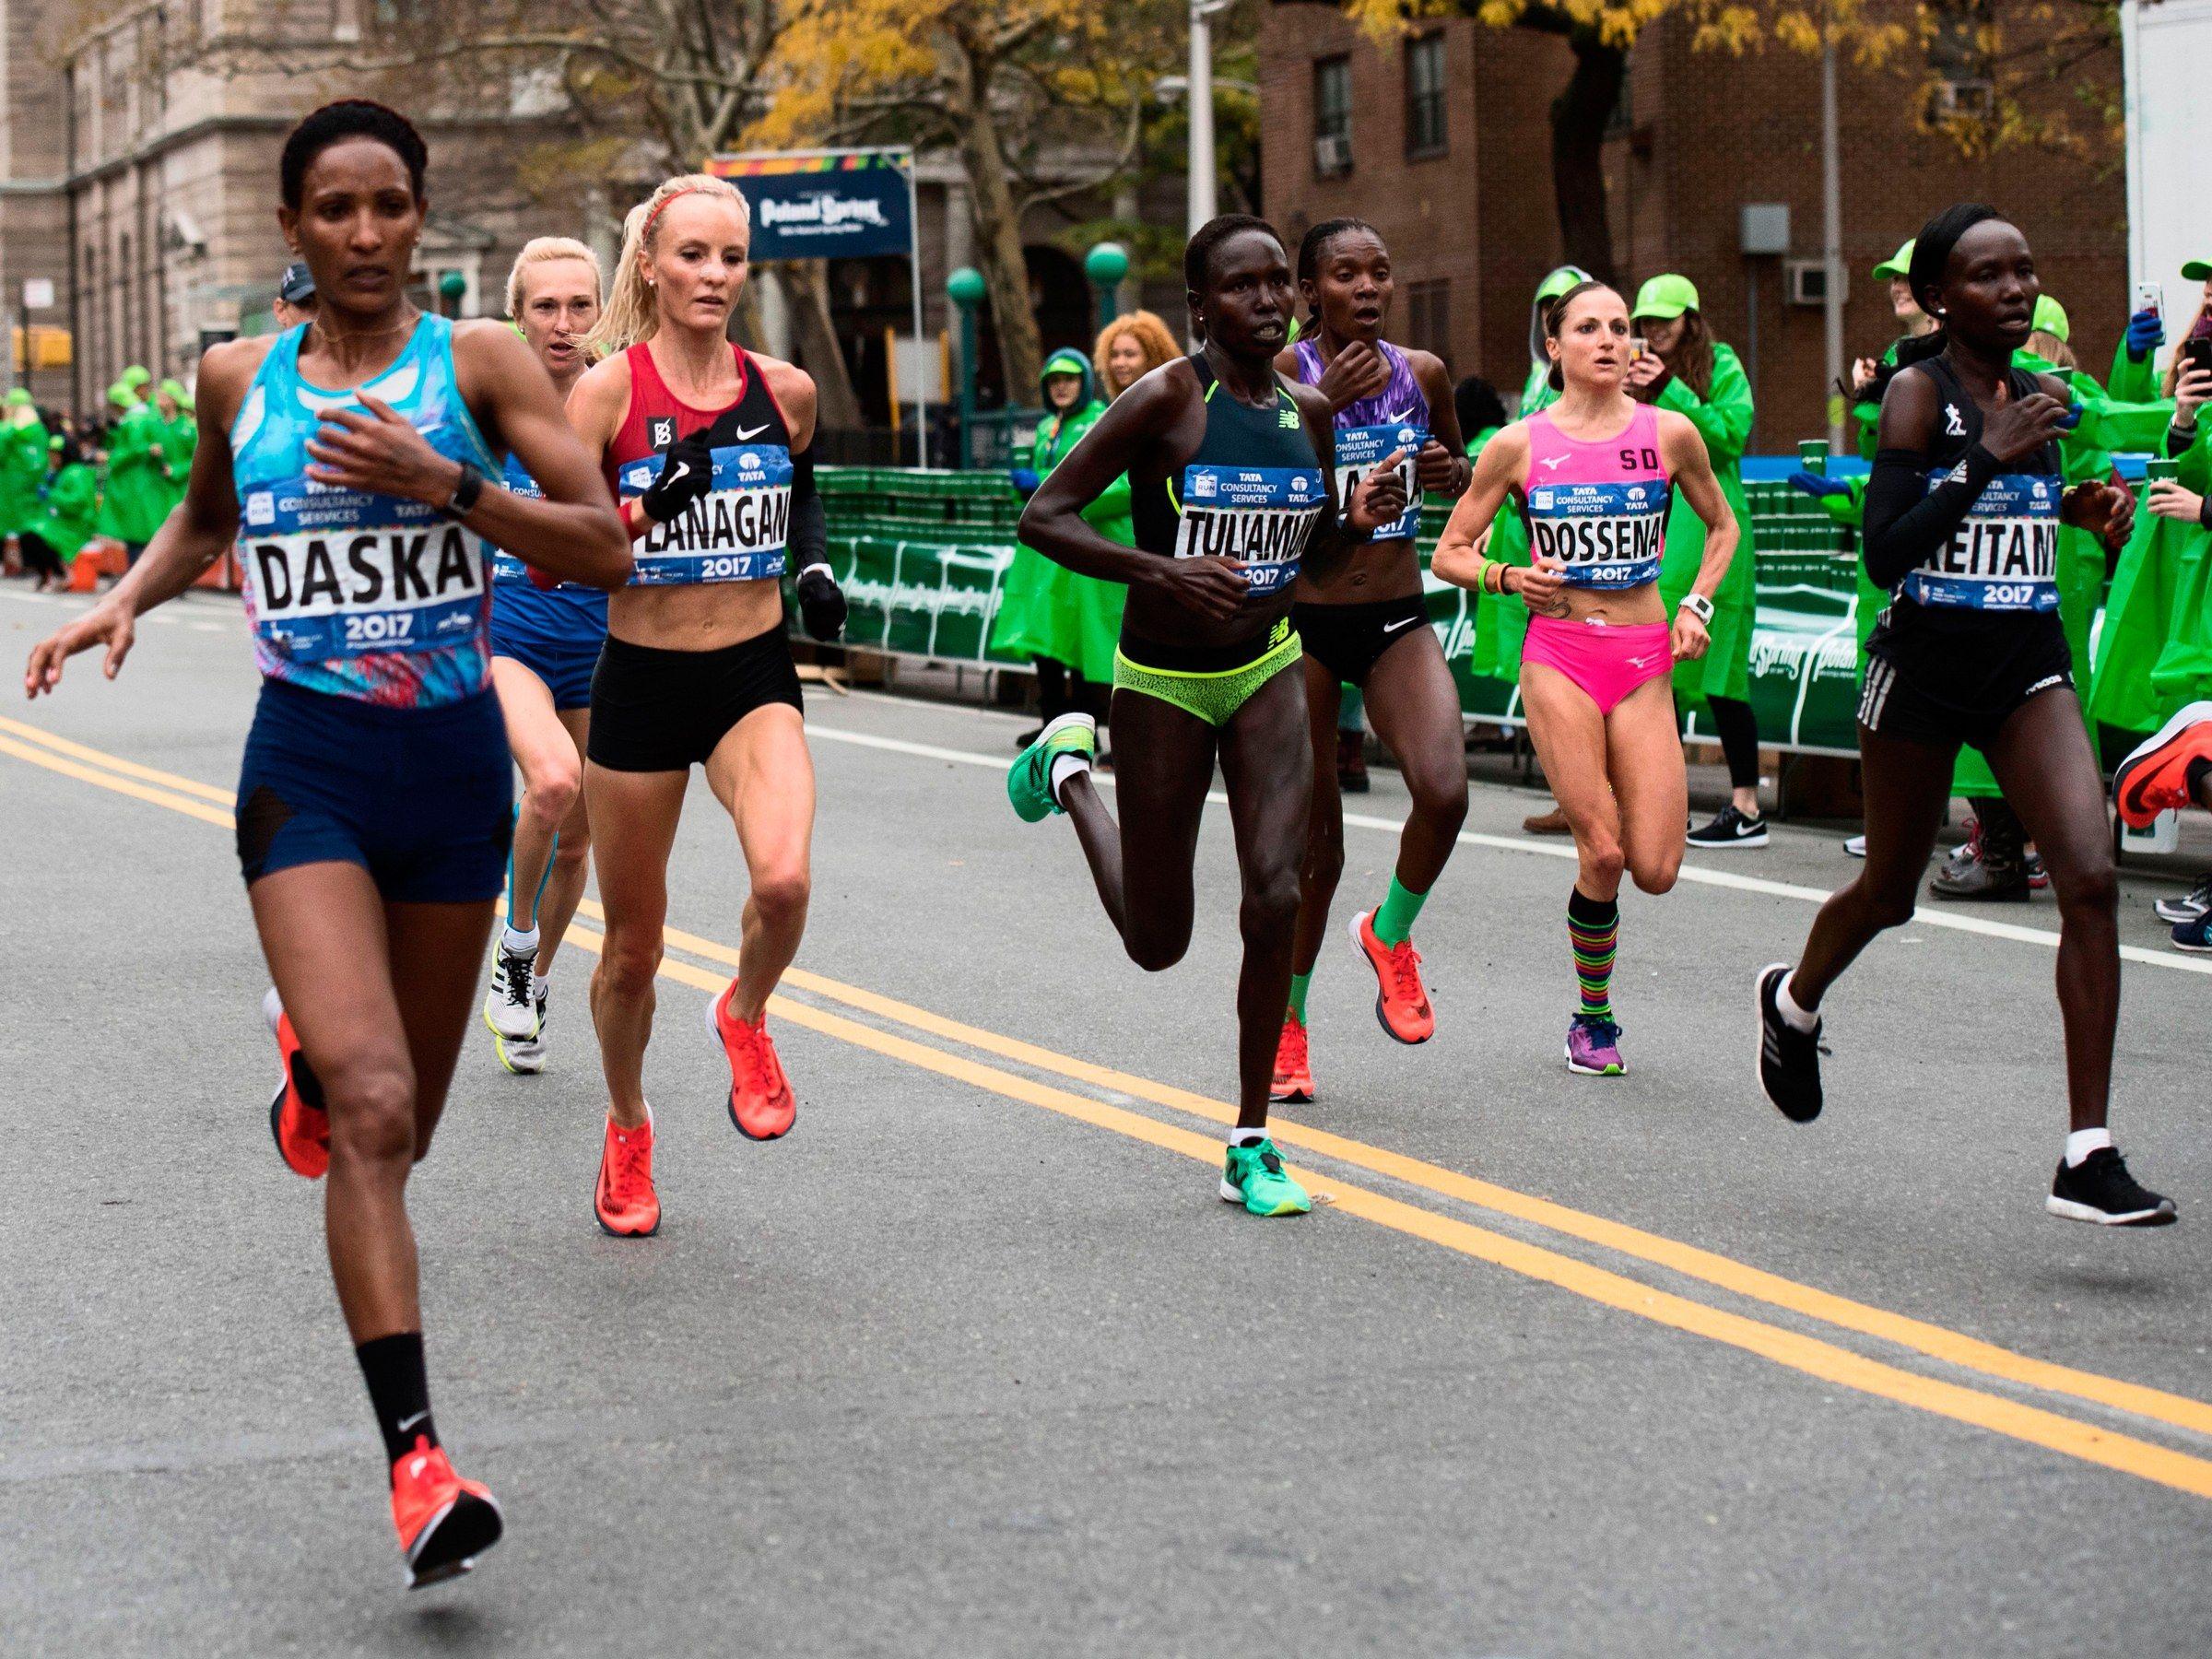 Do nikes new marathon shoes actually make you run faster